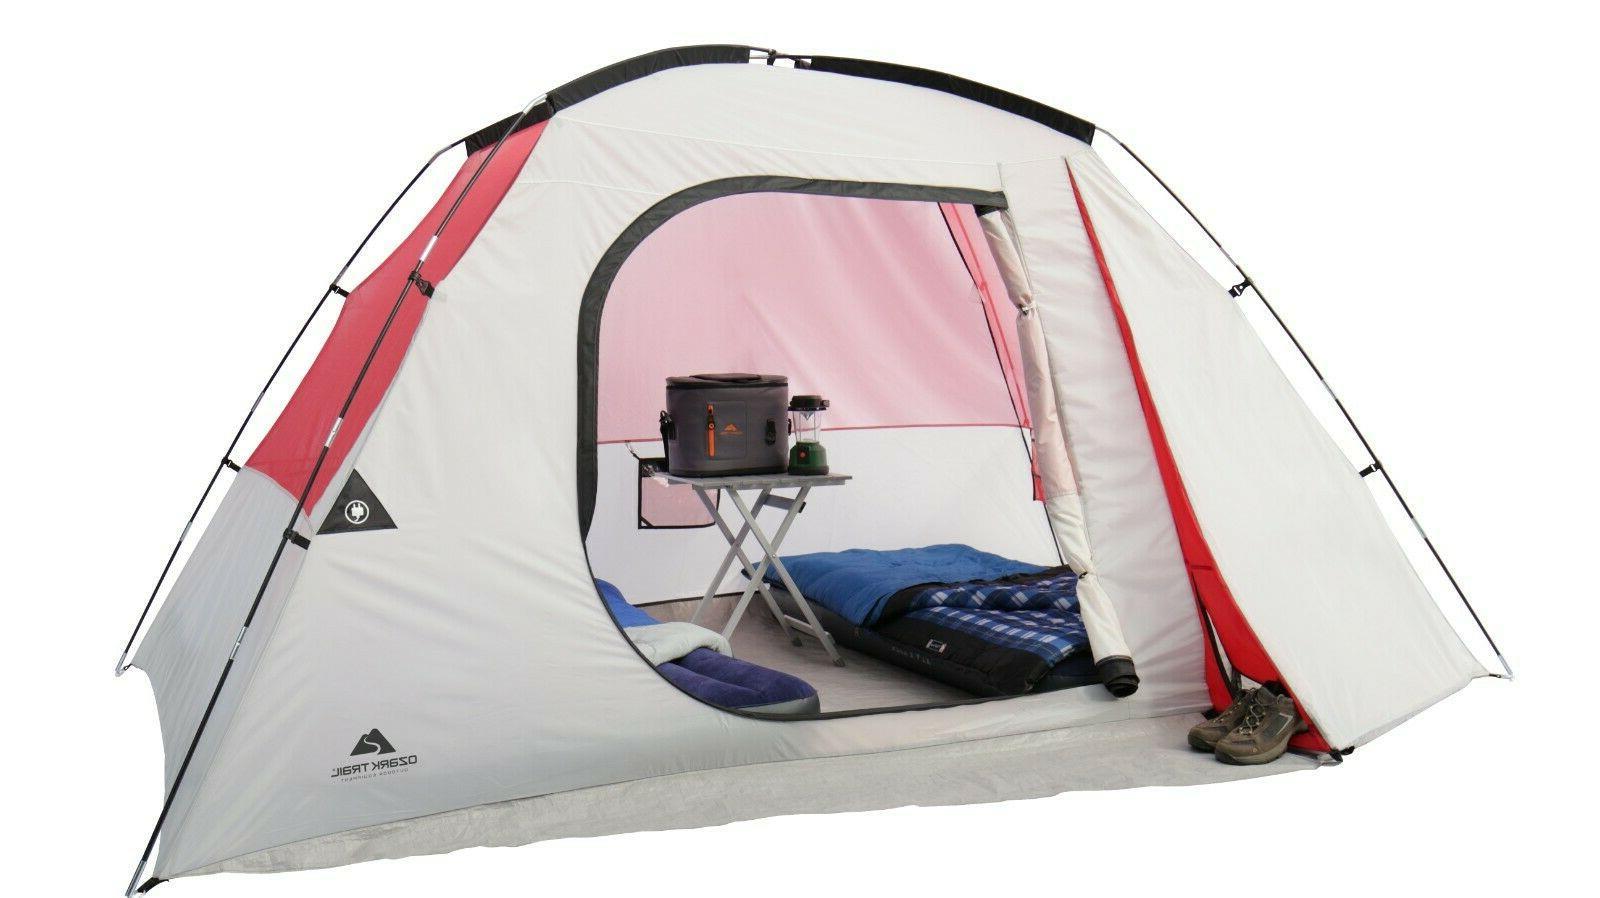 Ozark Trail 6 Person Dome Camping Tent, perfect